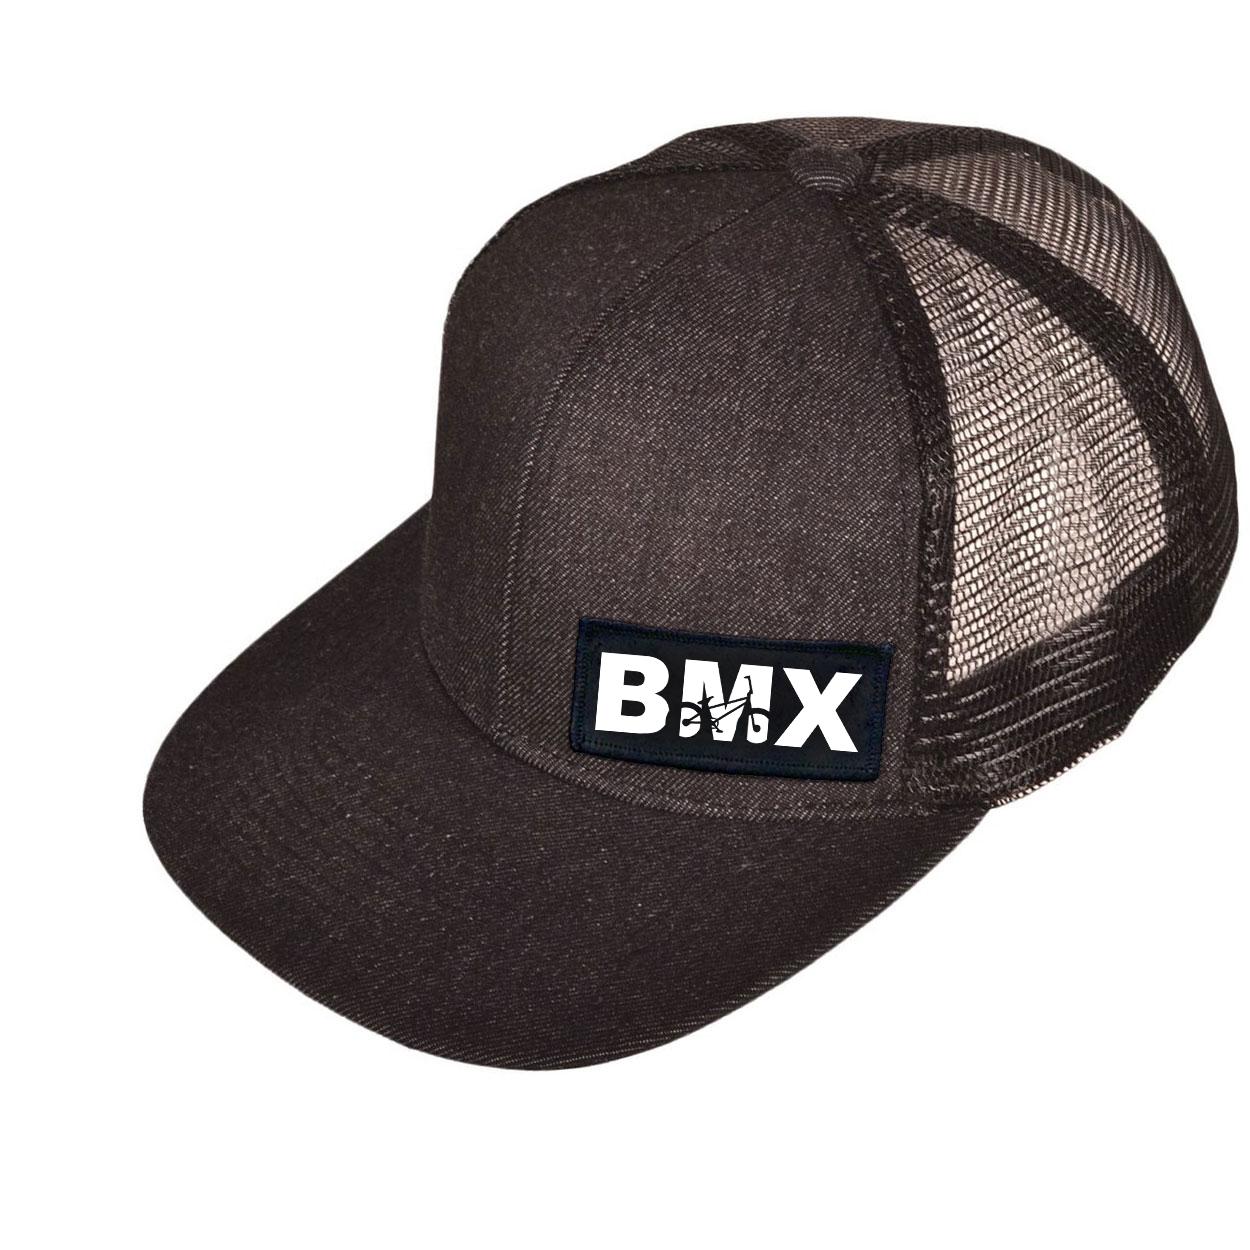 BMX Bike Logo Night Out Woven Patch Snapback Flat Brim Hat Black Denim (White Logo)